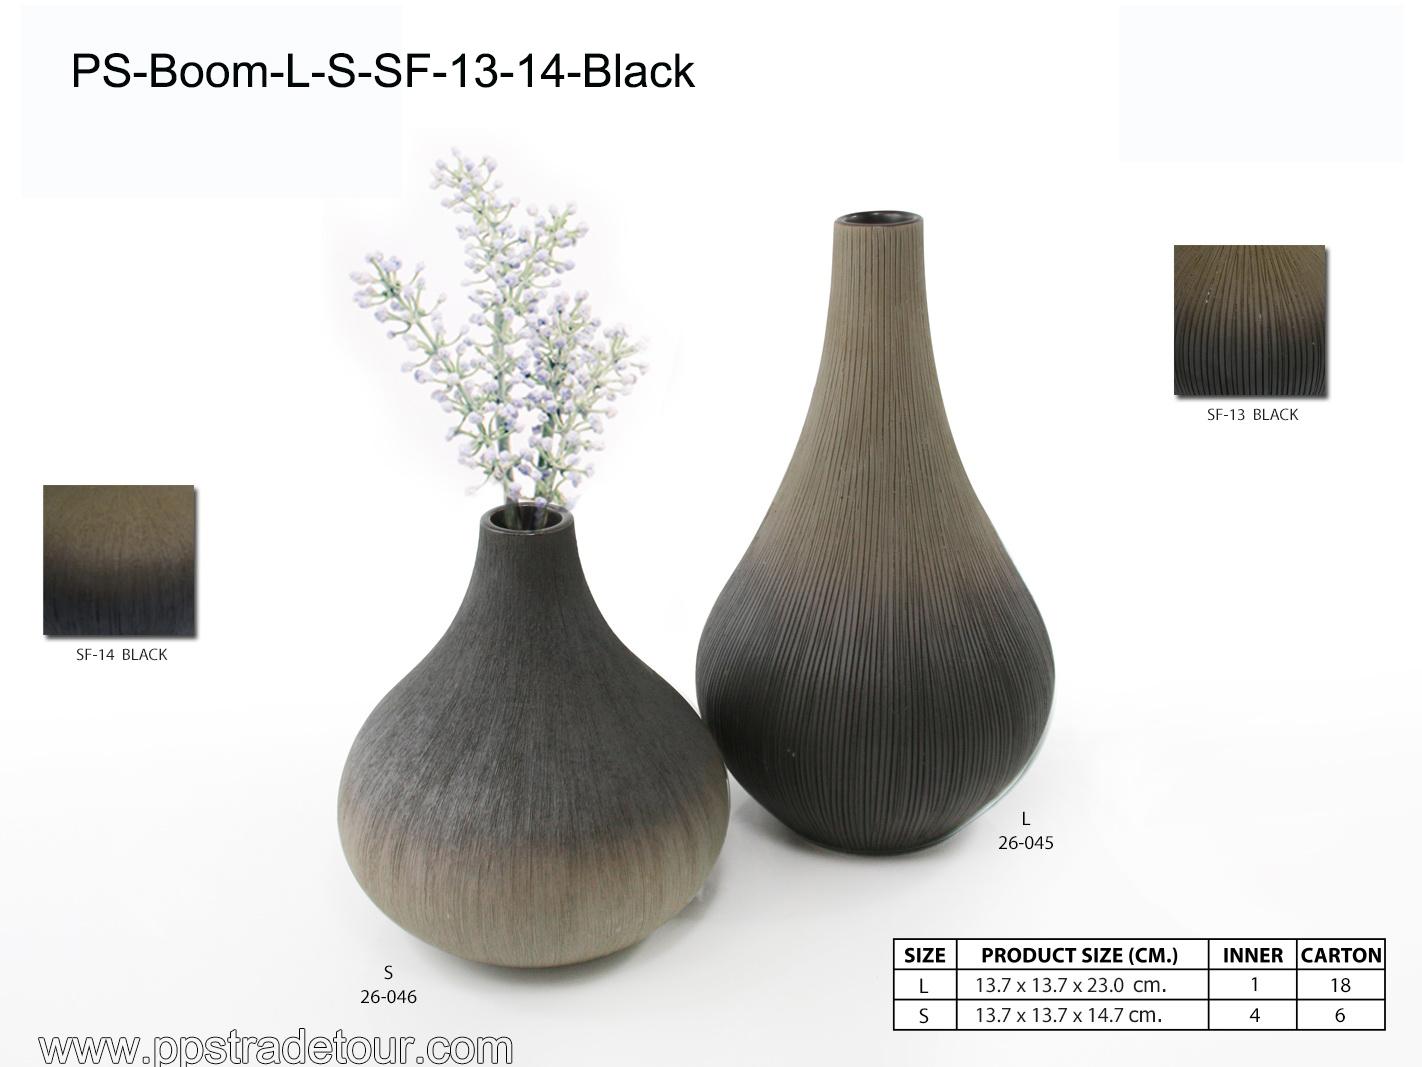 PSCV-BOOM-L-S-SF-13-14-BLACK